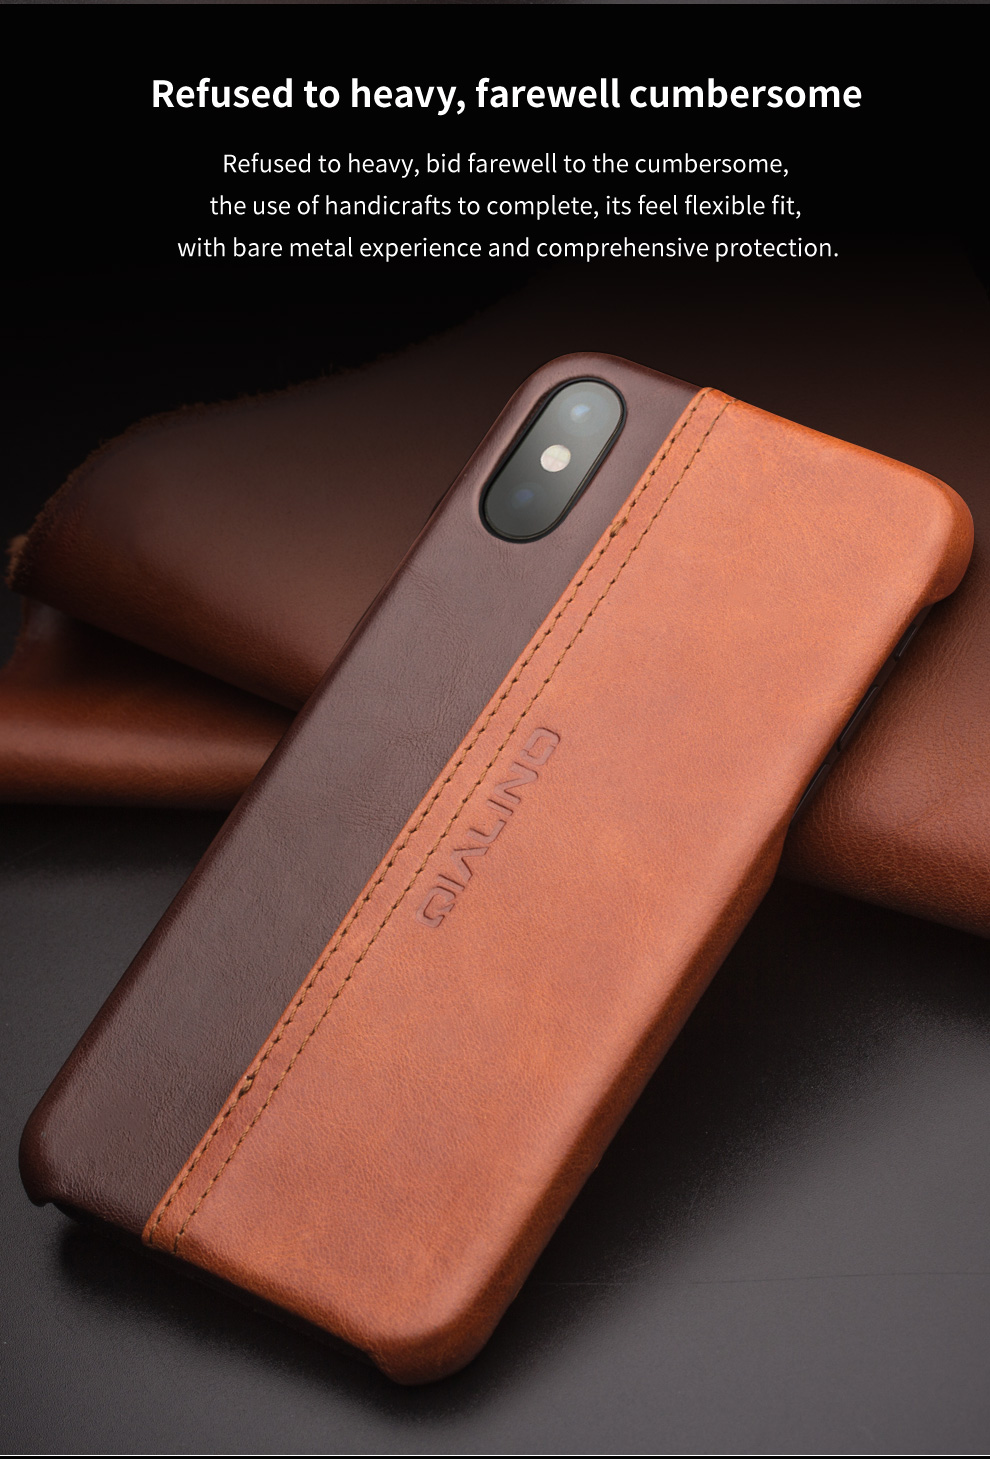 iphone x-_05